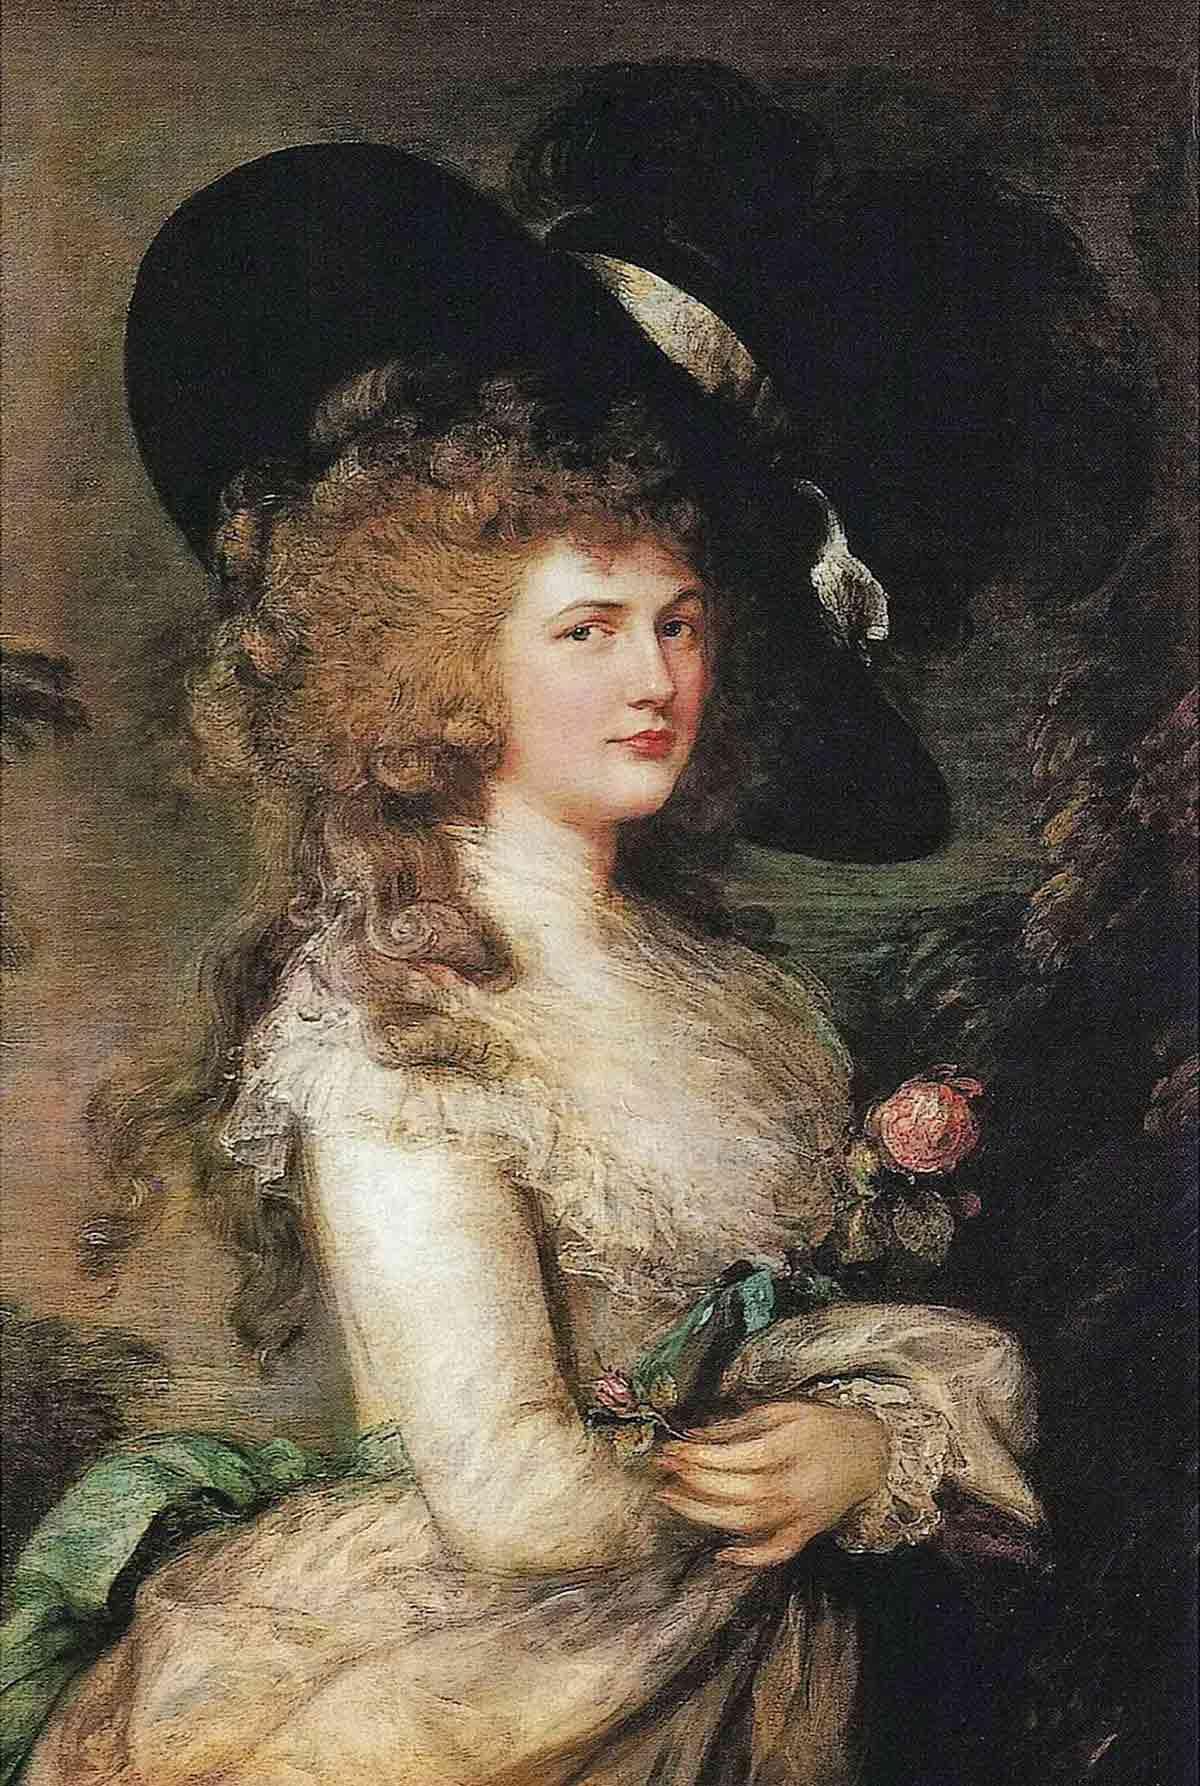 Gestohlenes Gemälde von Gainsborough: Portrait Lady Cavendish (1787)